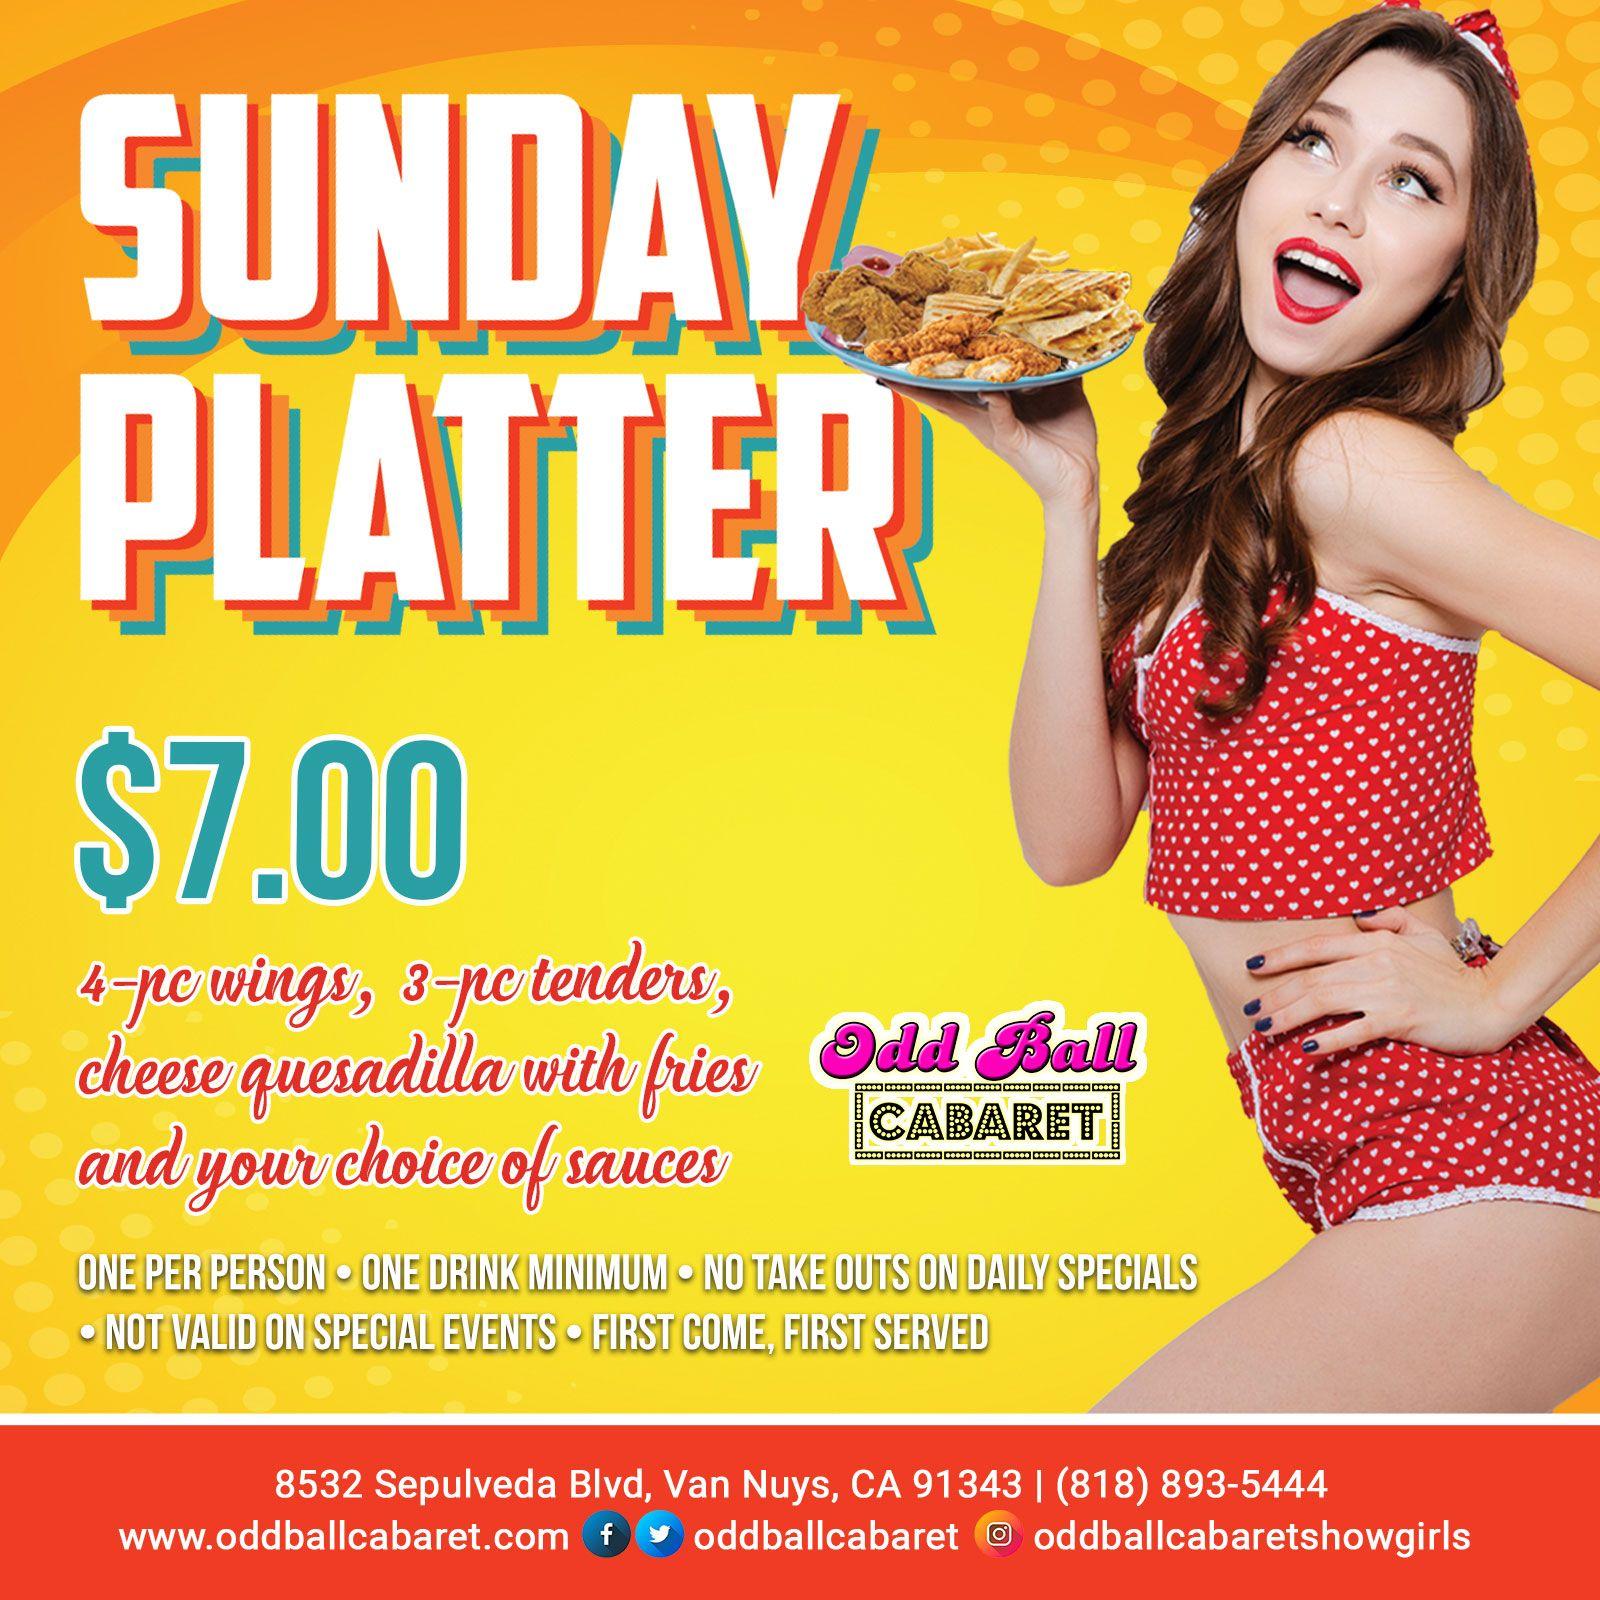 SUNDAY Platter